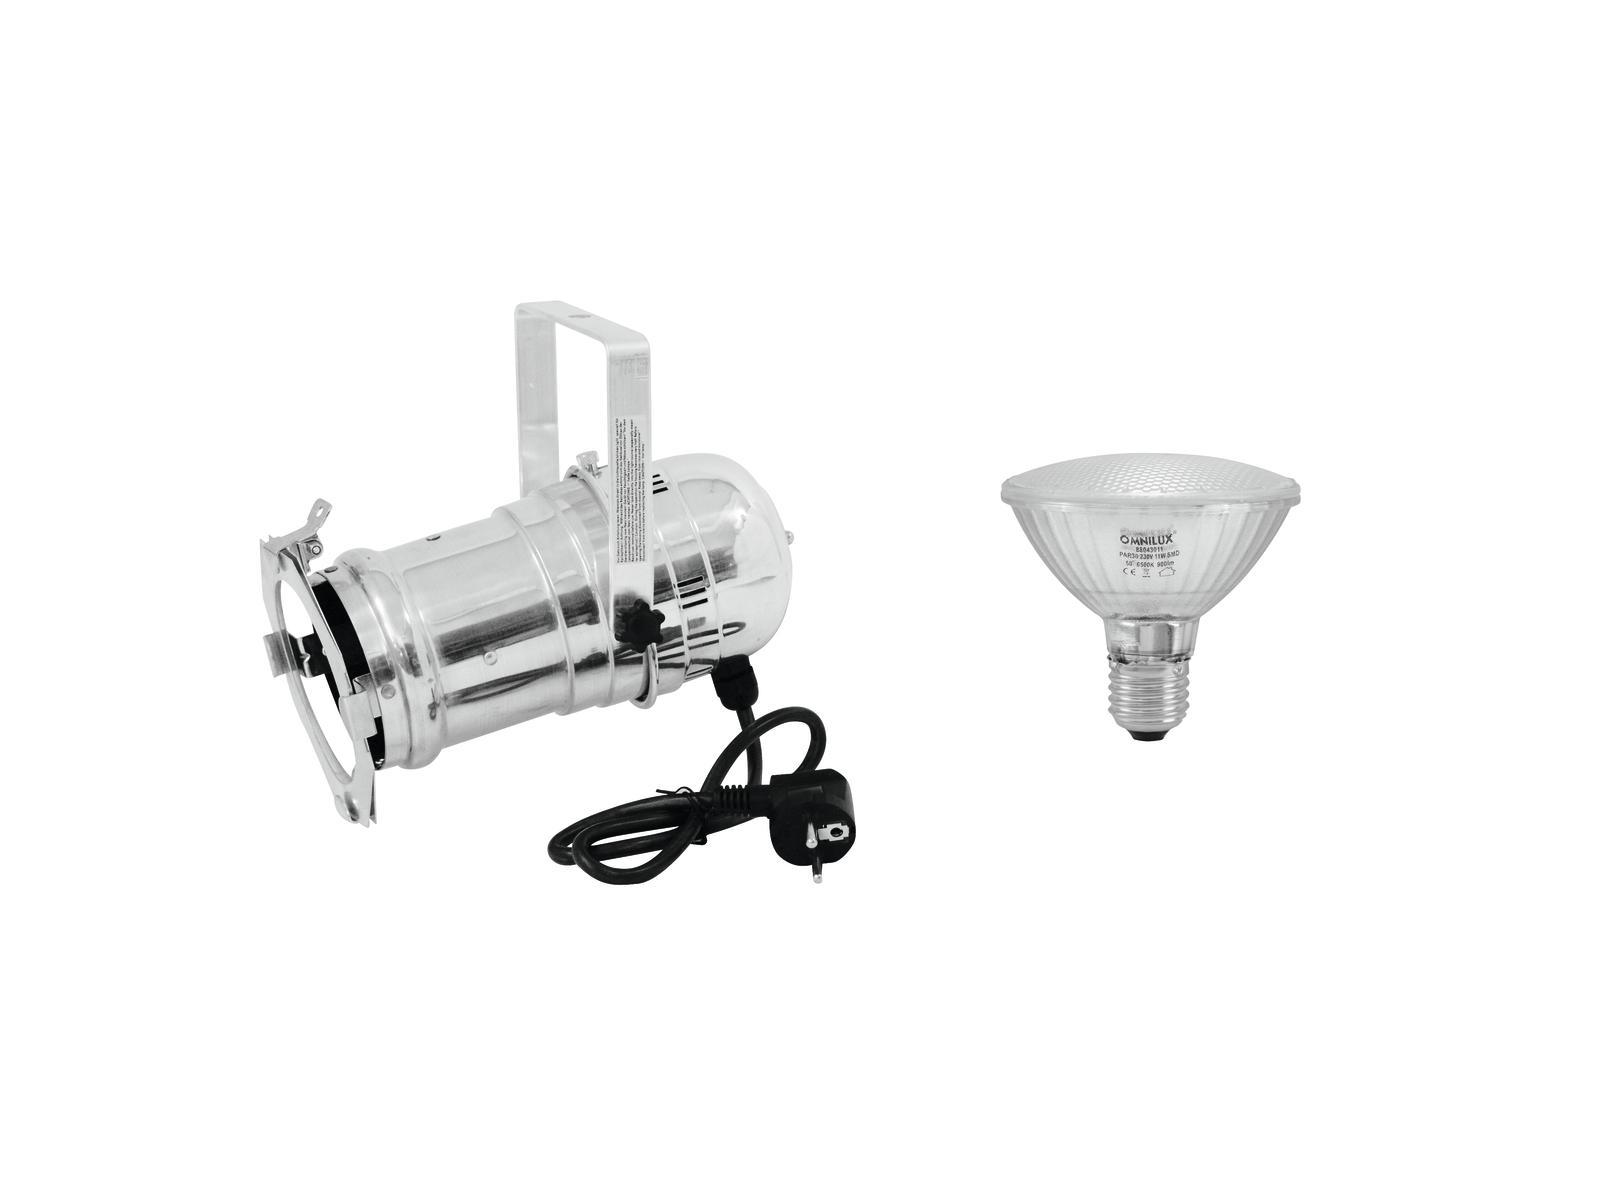 EUROLITE Set PAR-30 Spot sil + PAR-30 230V SMD 11W E-27 LED 6500K